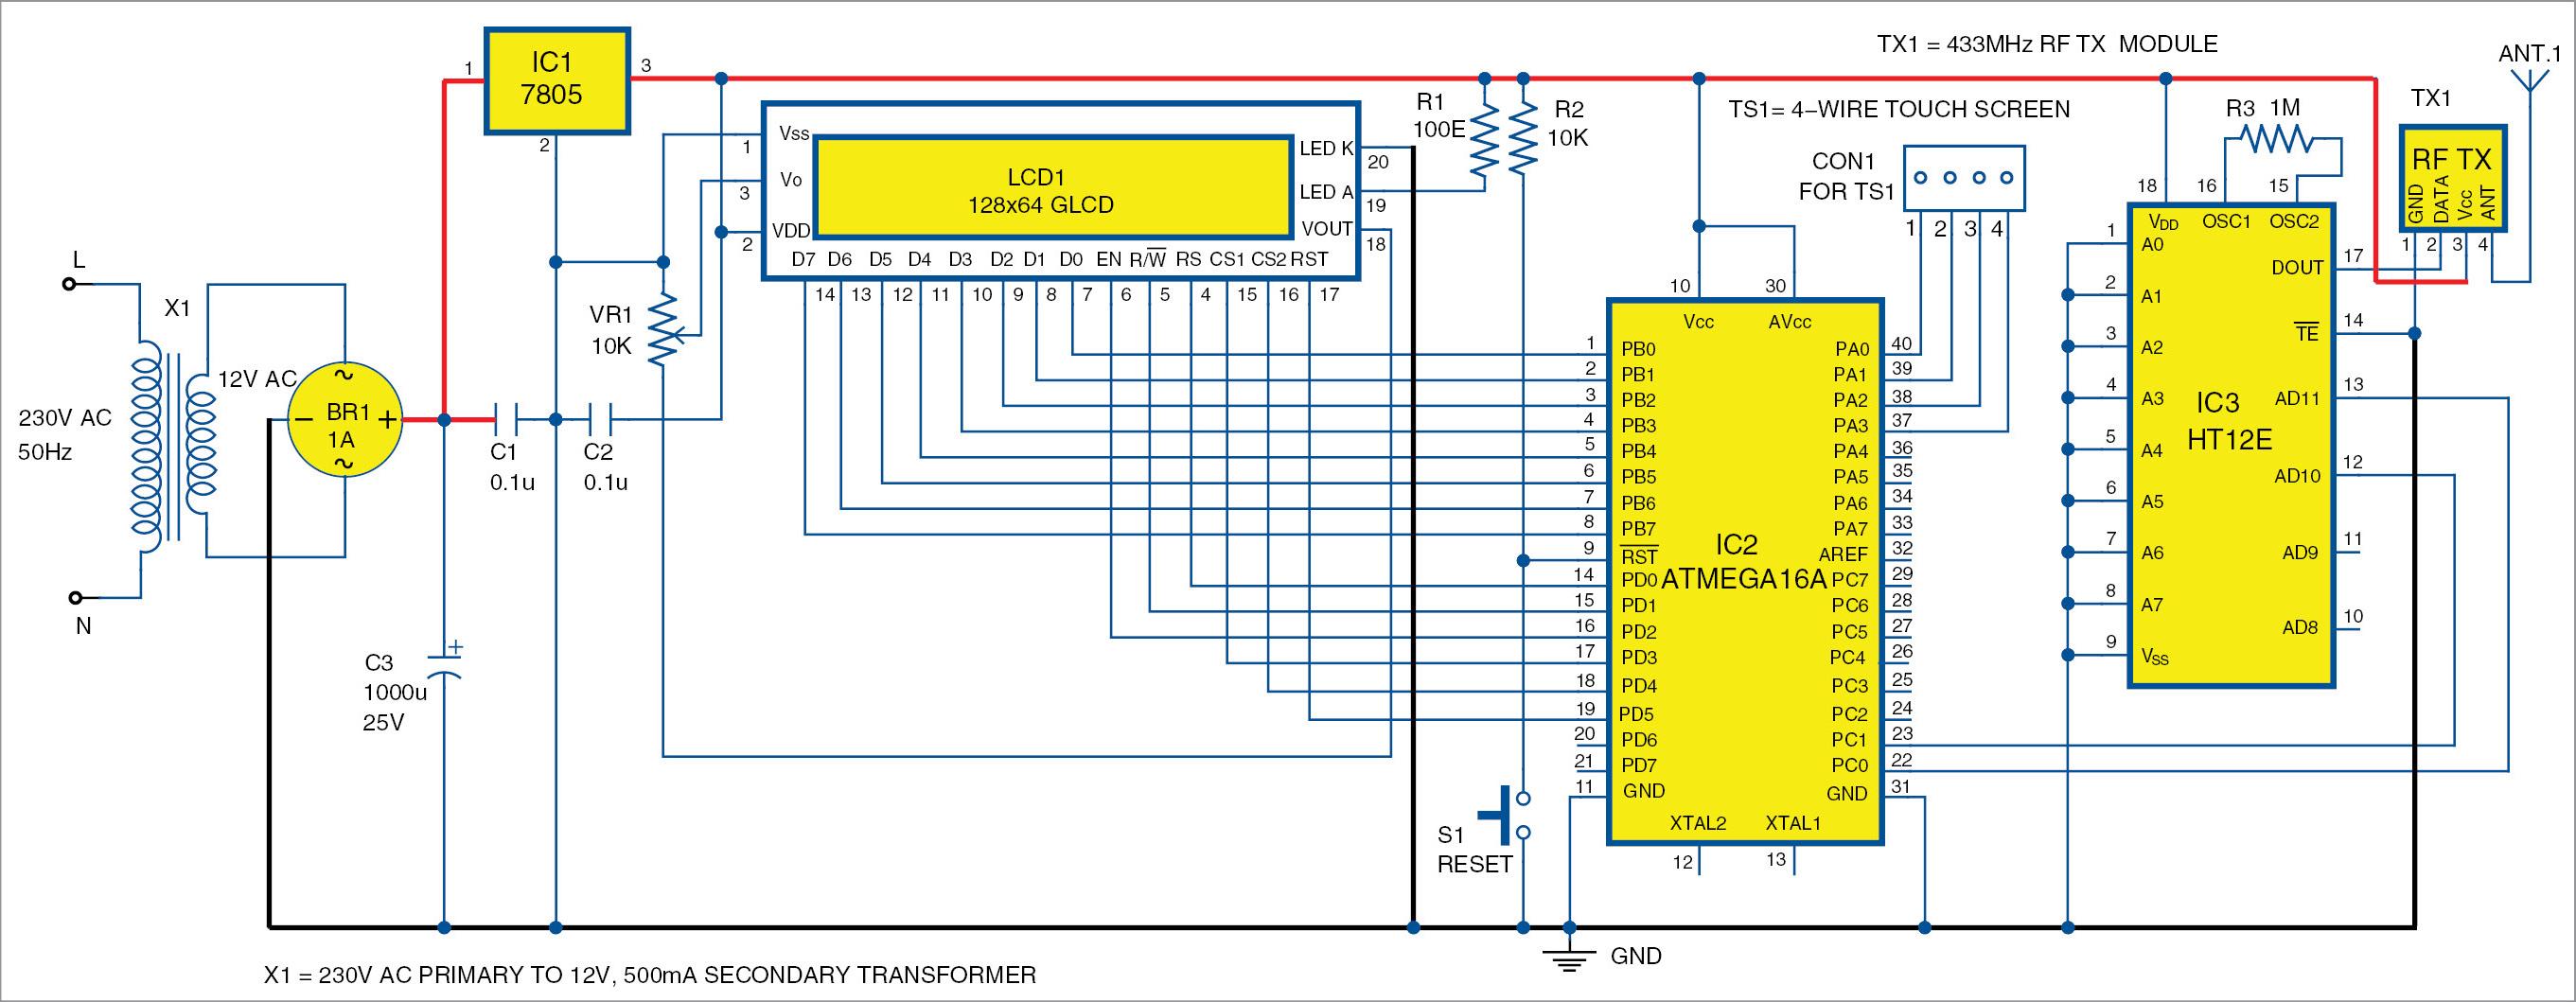 Circuit diagram of the transmitter